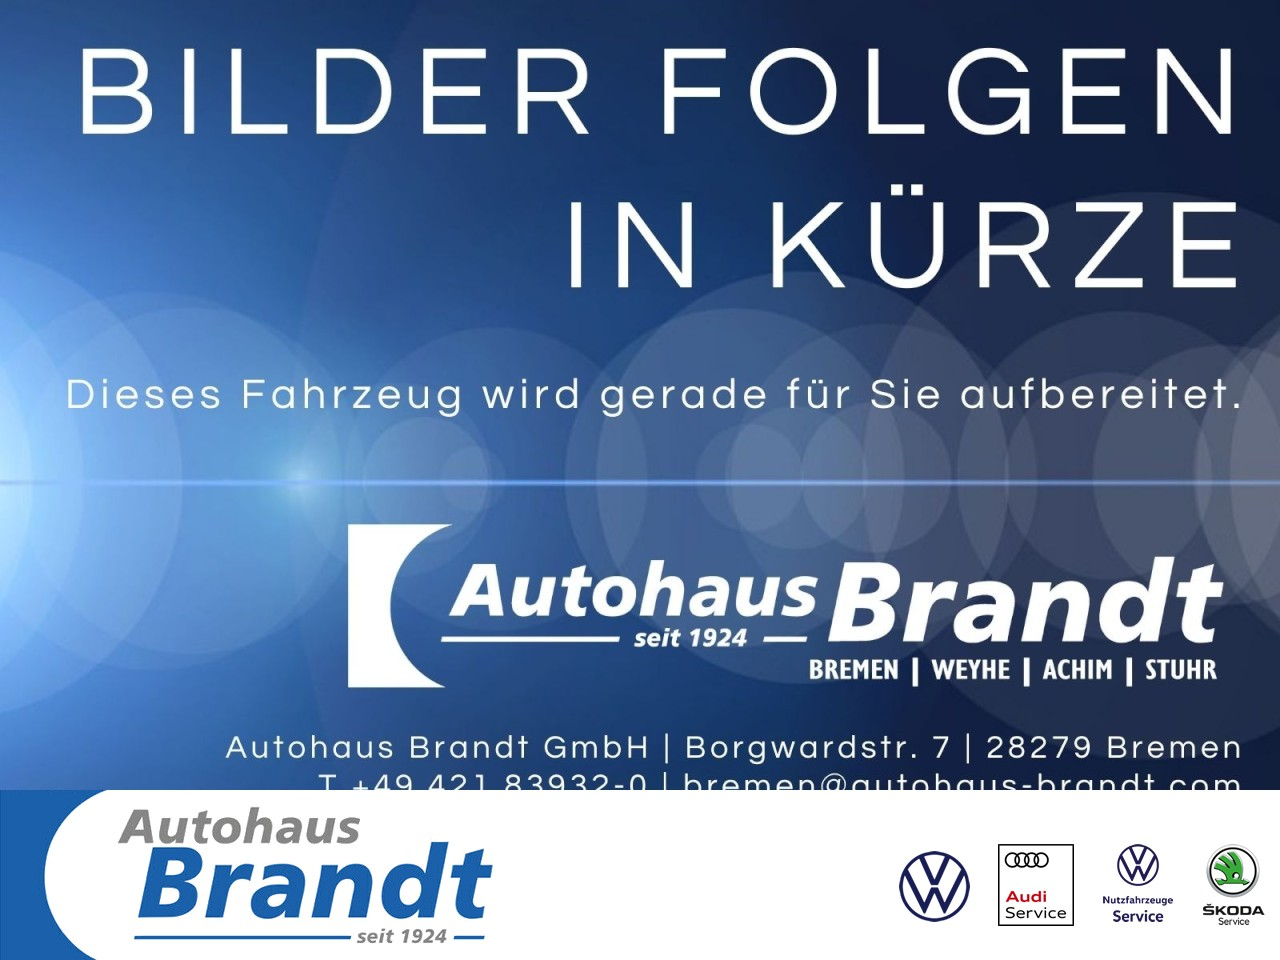 Audi A4 Avant 2.0 TDI quattro S-LINE*S-TRONIC*LED*KAMERA*ACC*AHK, Jahr 2018, Diesel